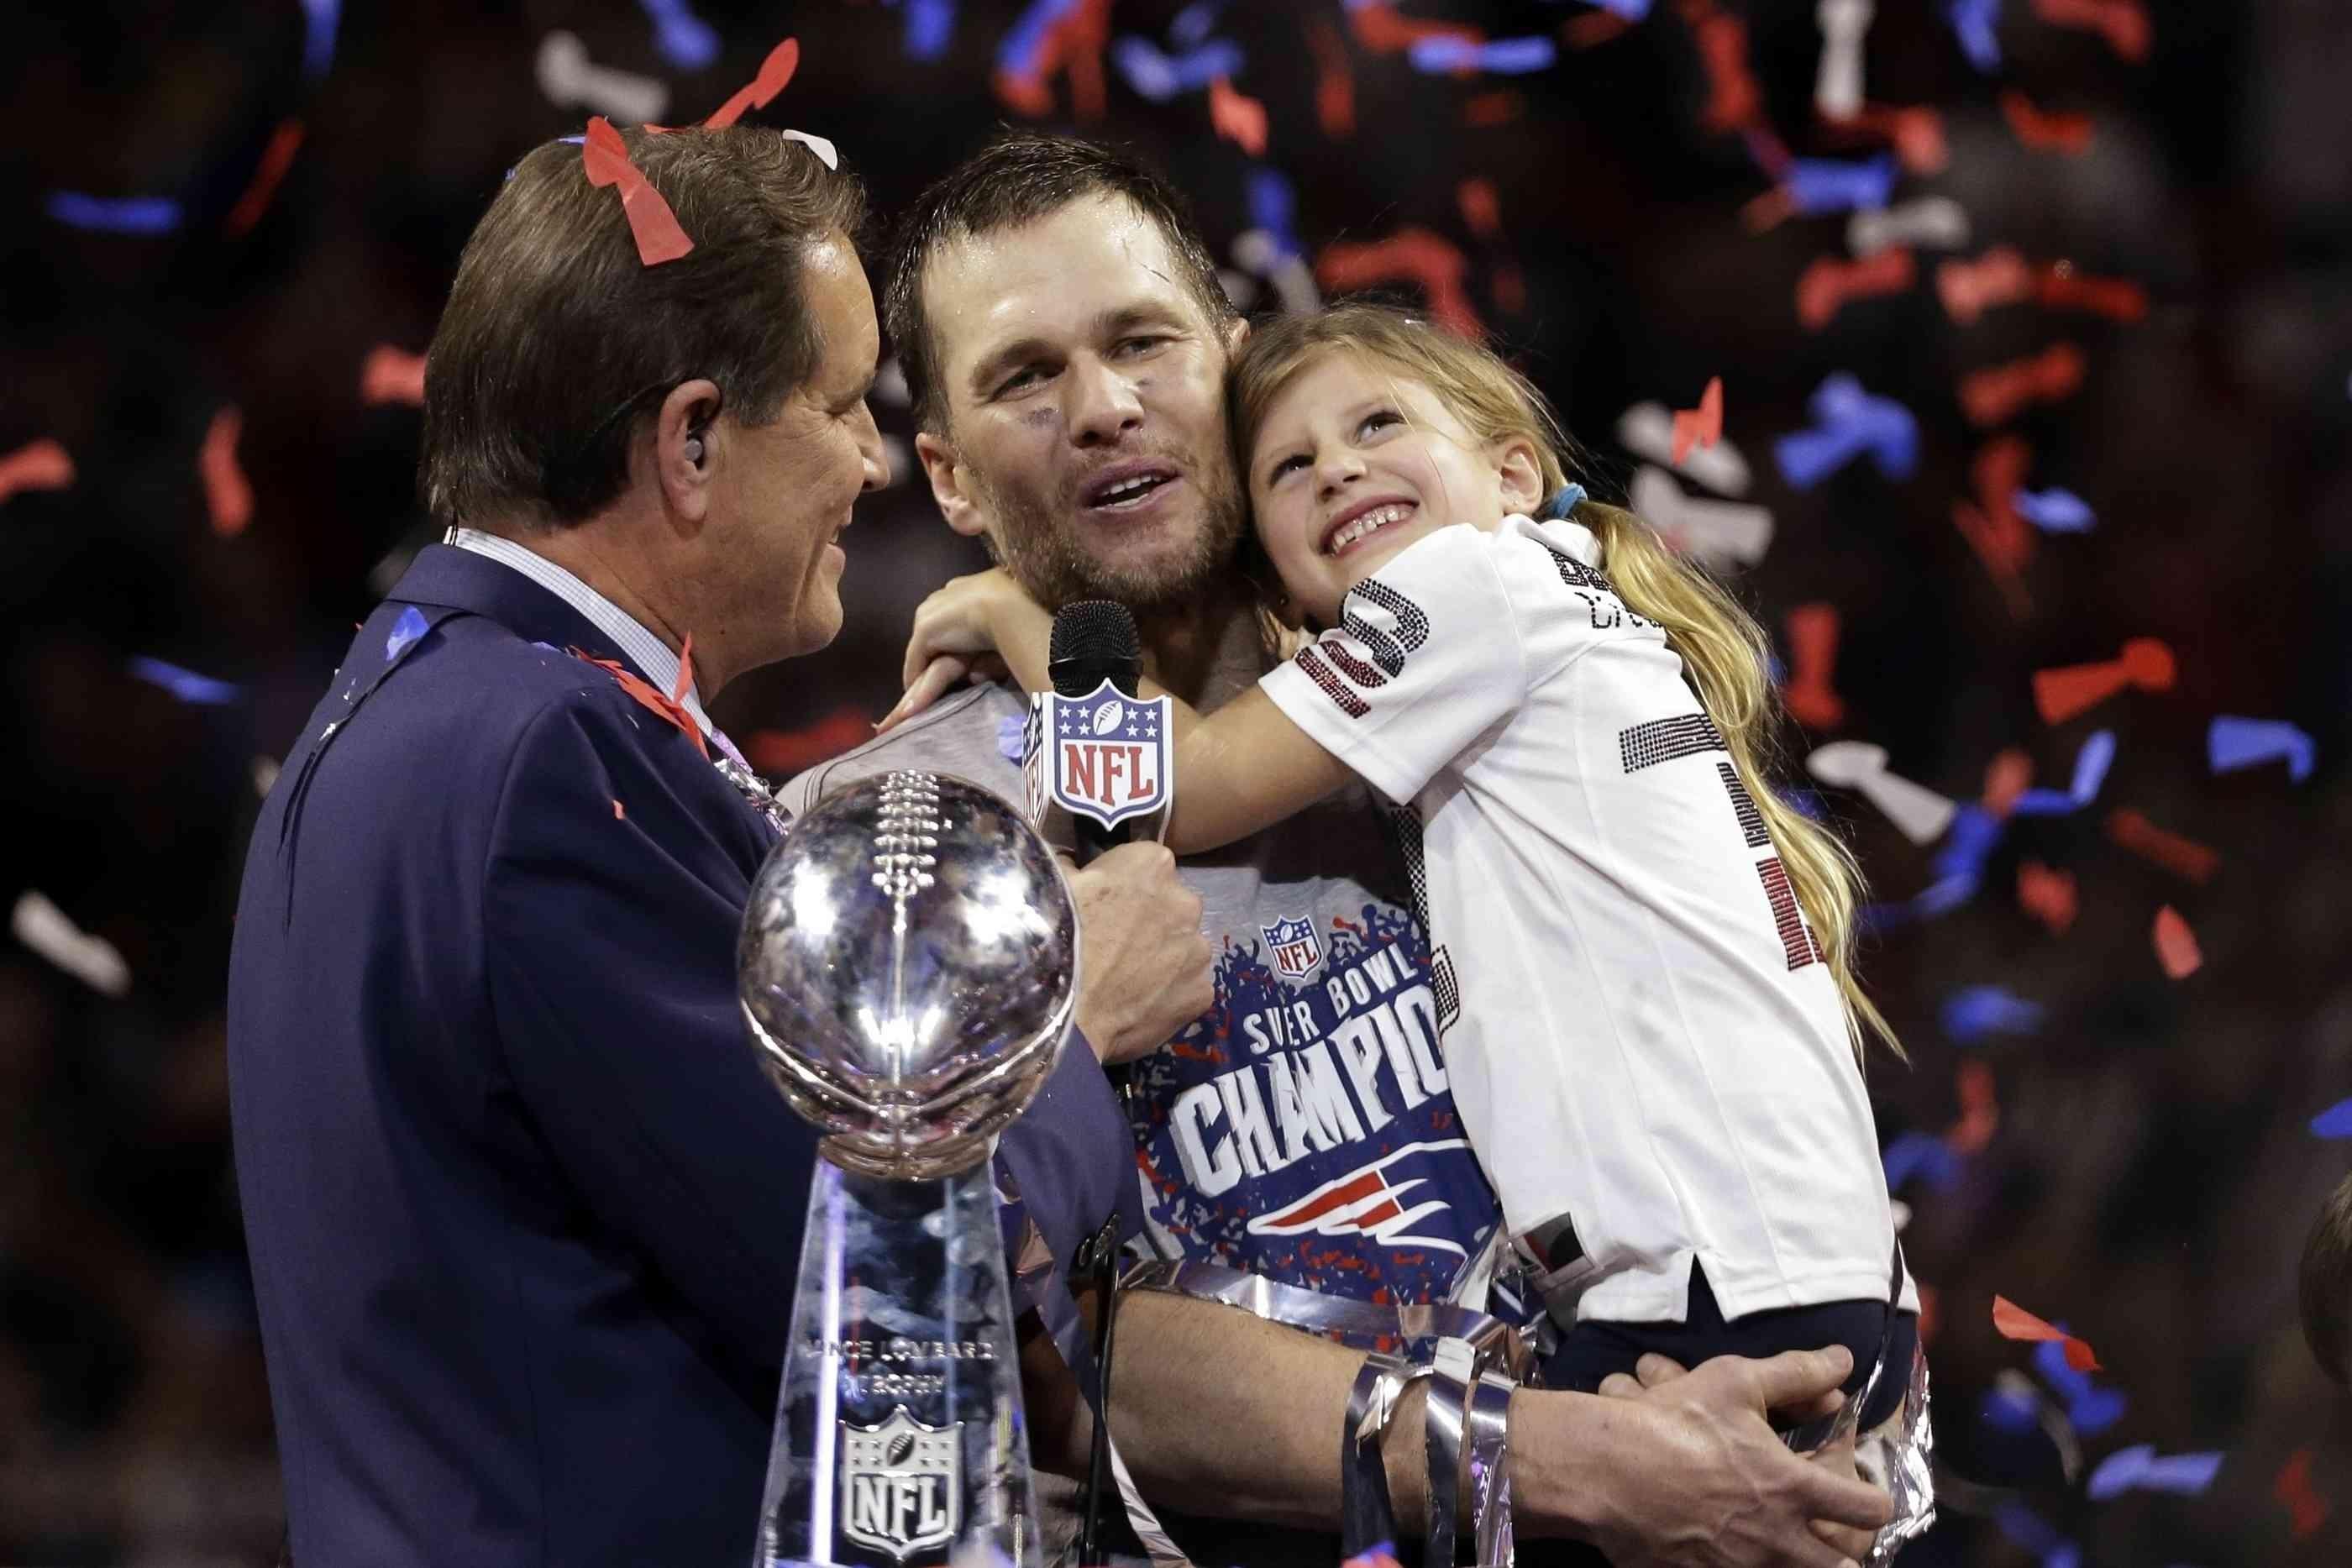 Super Bowl 2019: Tom Brady Feiert 6. Titel Mit Seiner intended for Tom Brady Super Bowl 2019